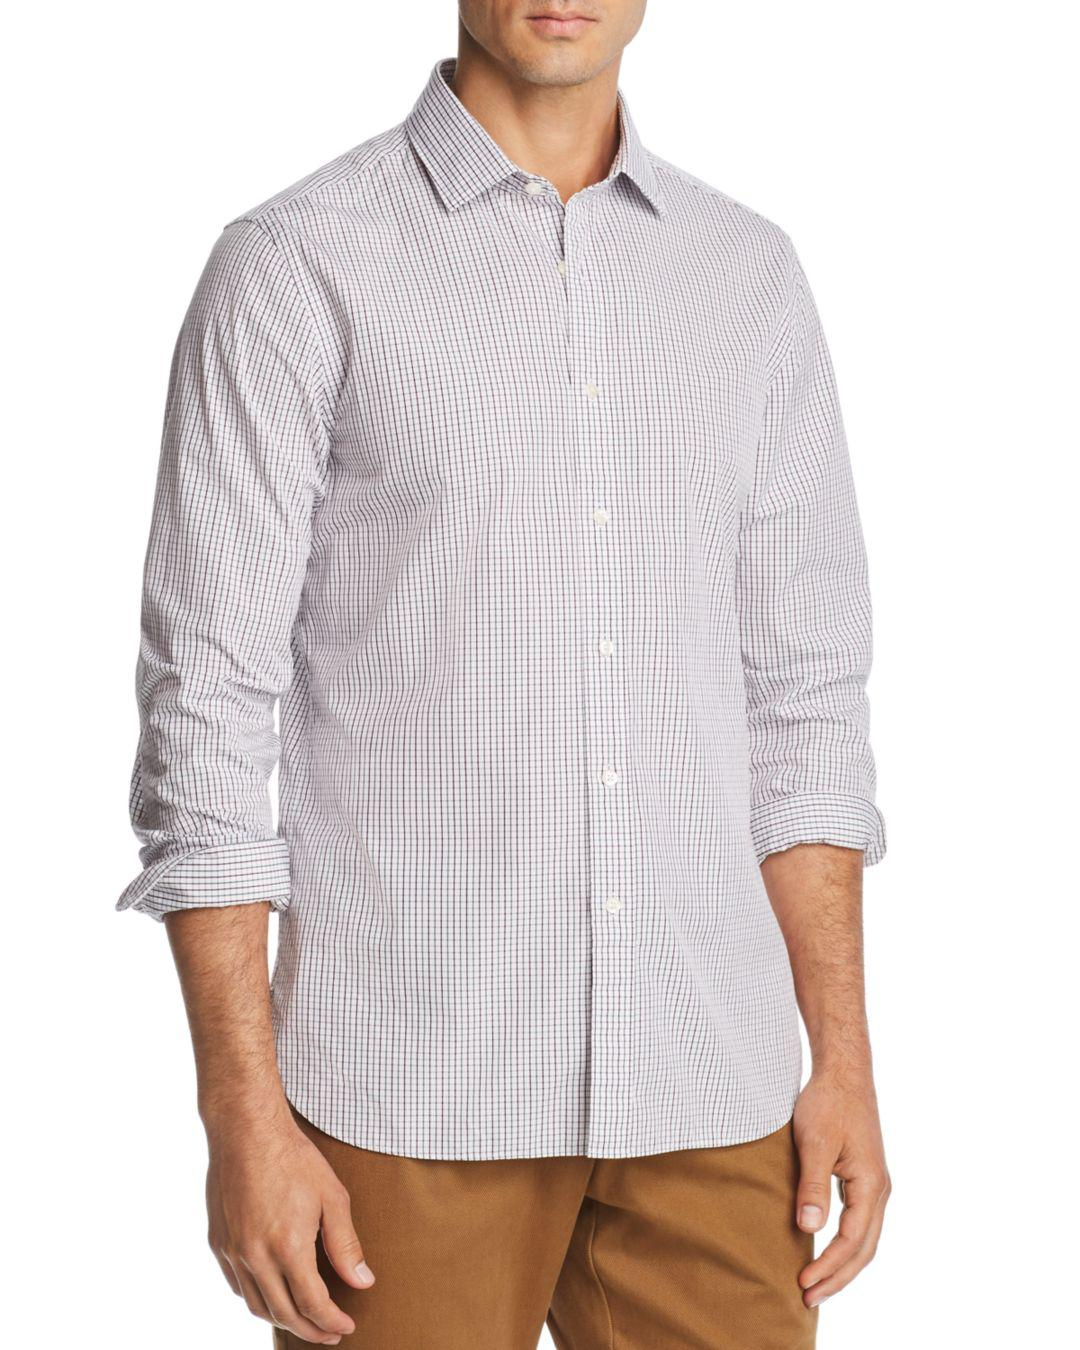 Bloomingdales Grid Print Broadcloth Slim Fit Shirt For Men Lyst